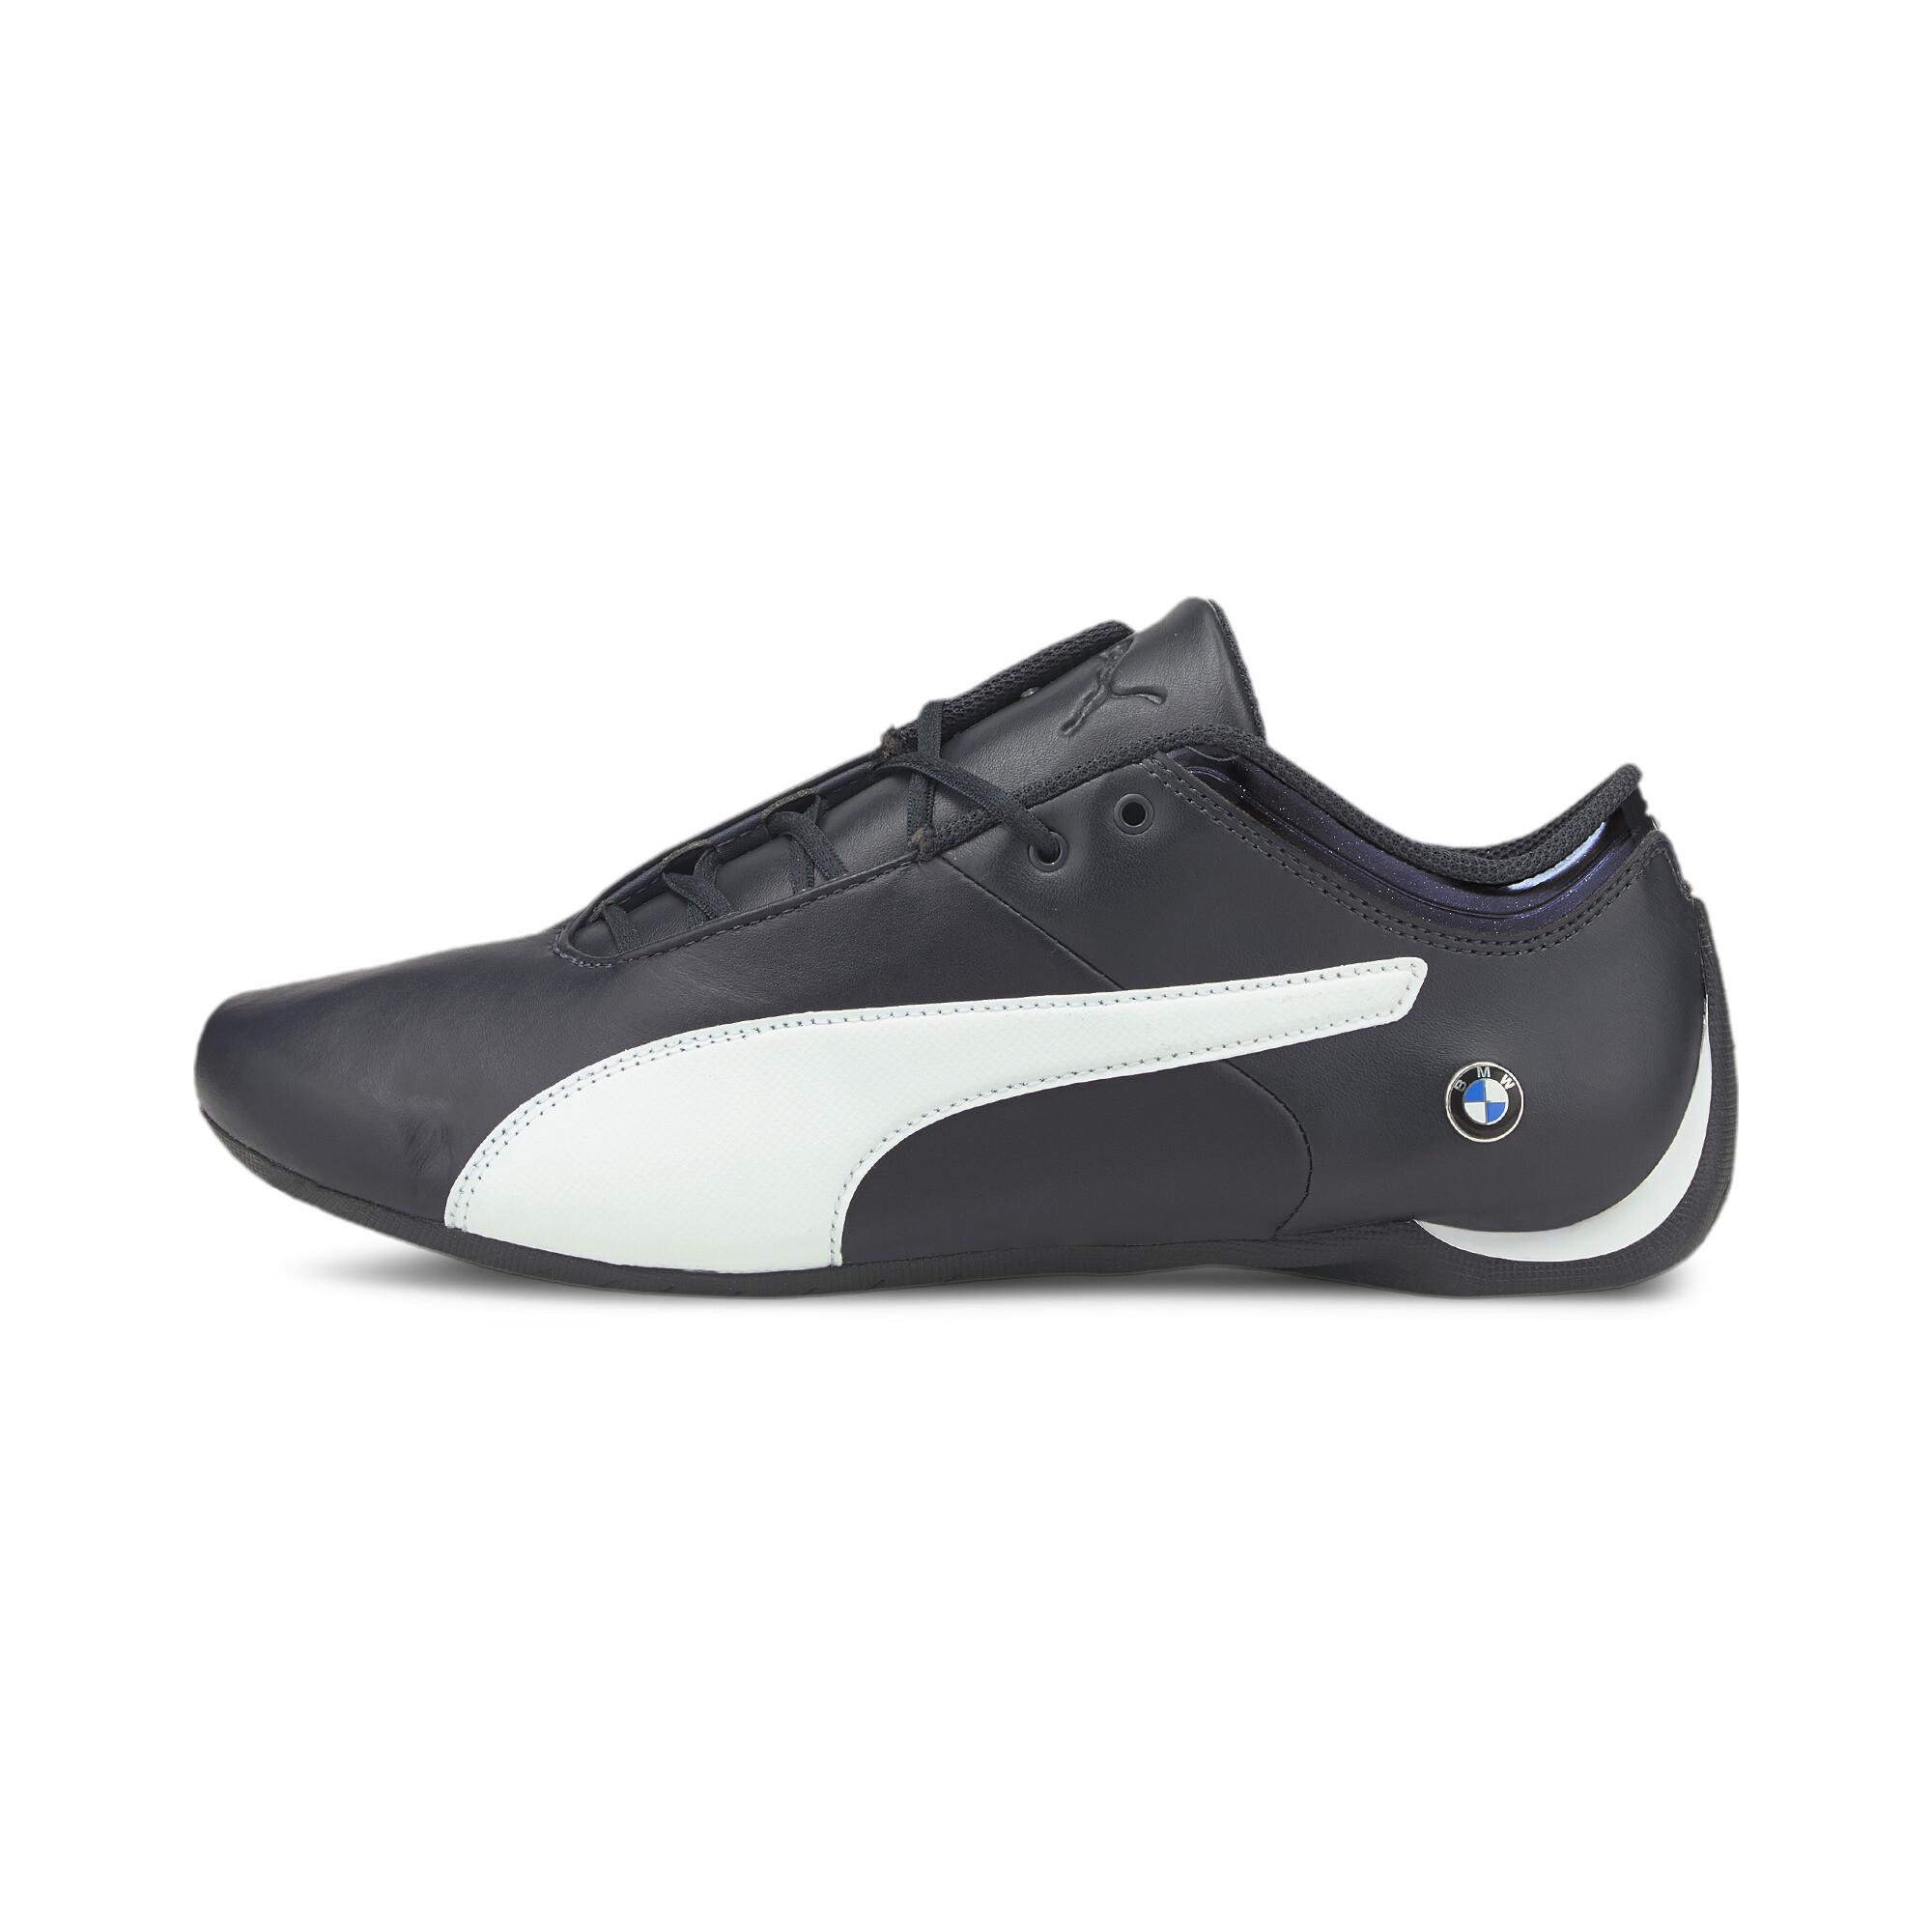 PUMA-BMW-Motorsport-Future-Cat-Sneaker-Maenner-Schuhe-Neu Indexbild 16